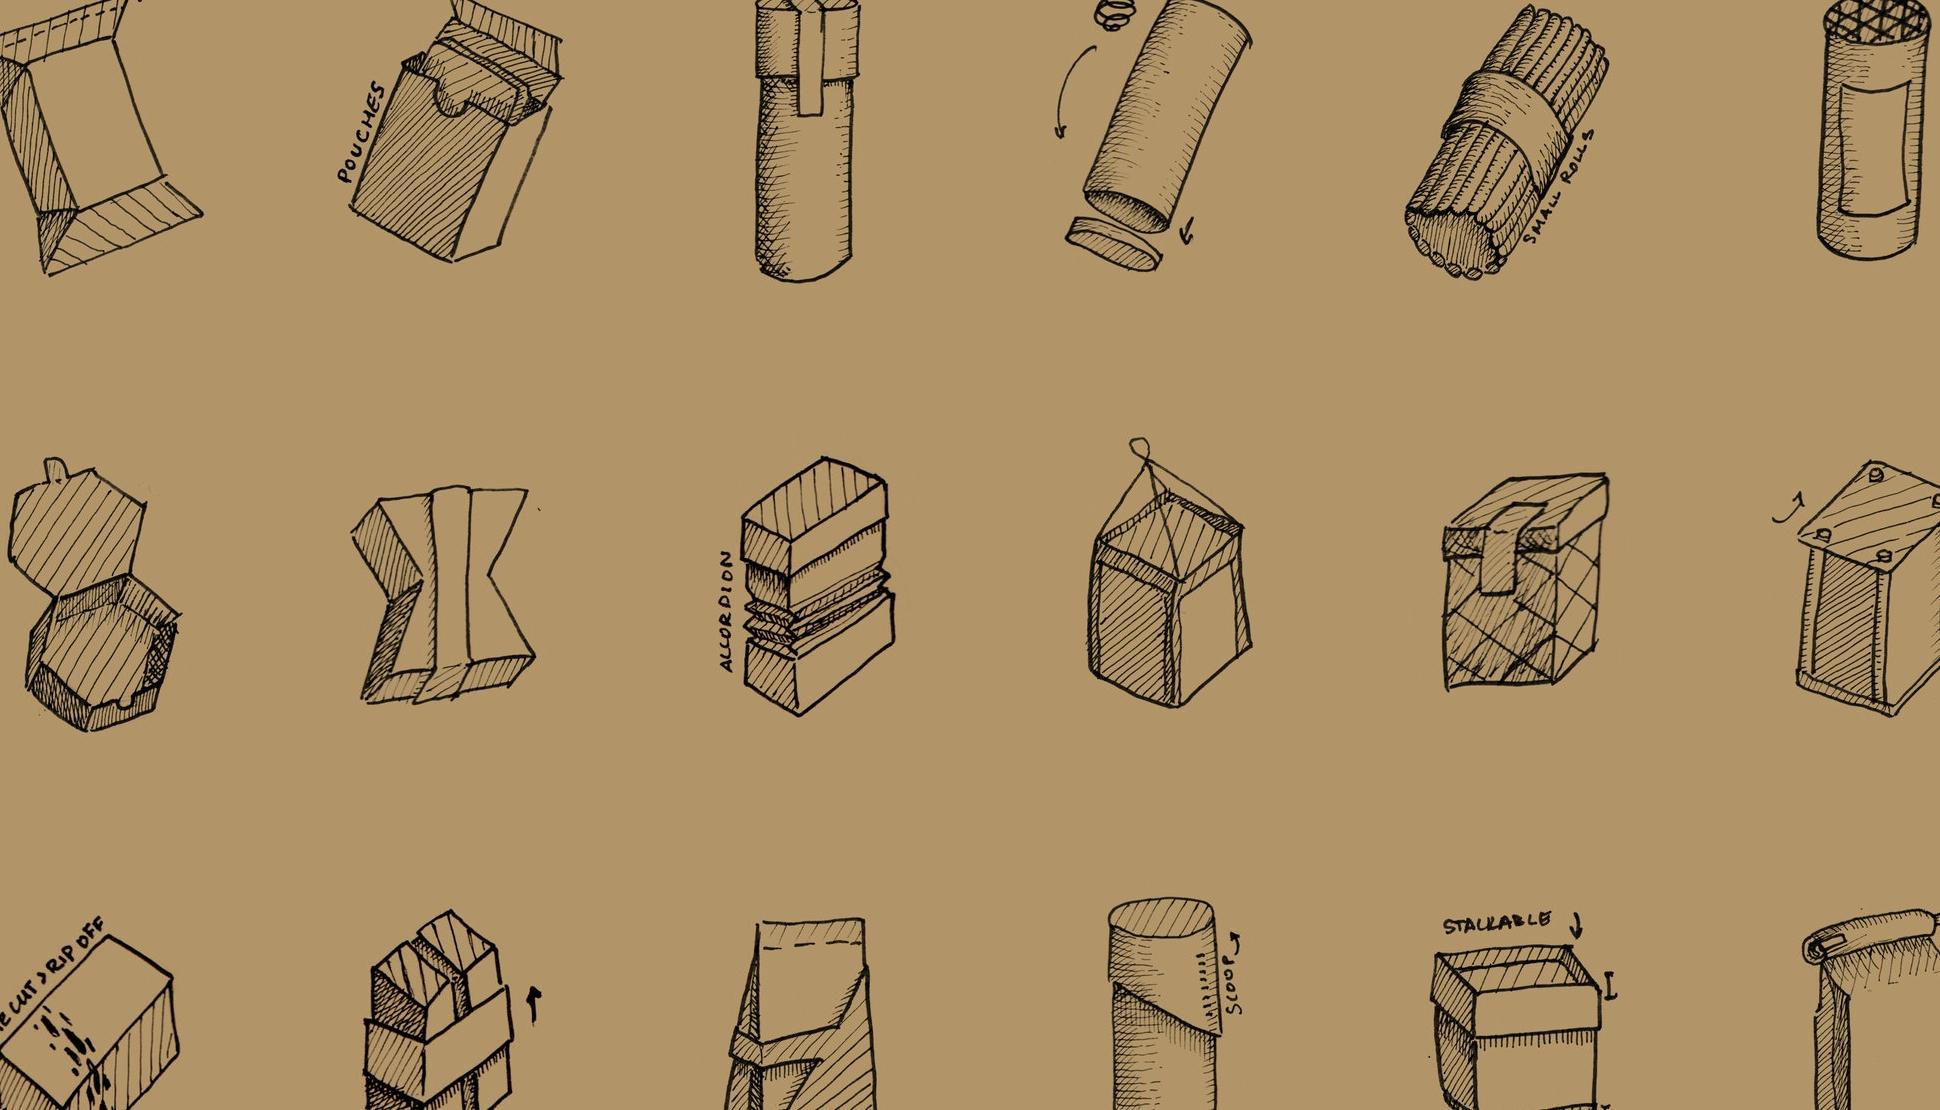 Web_Packaging_Schetches_Shoji.jpg